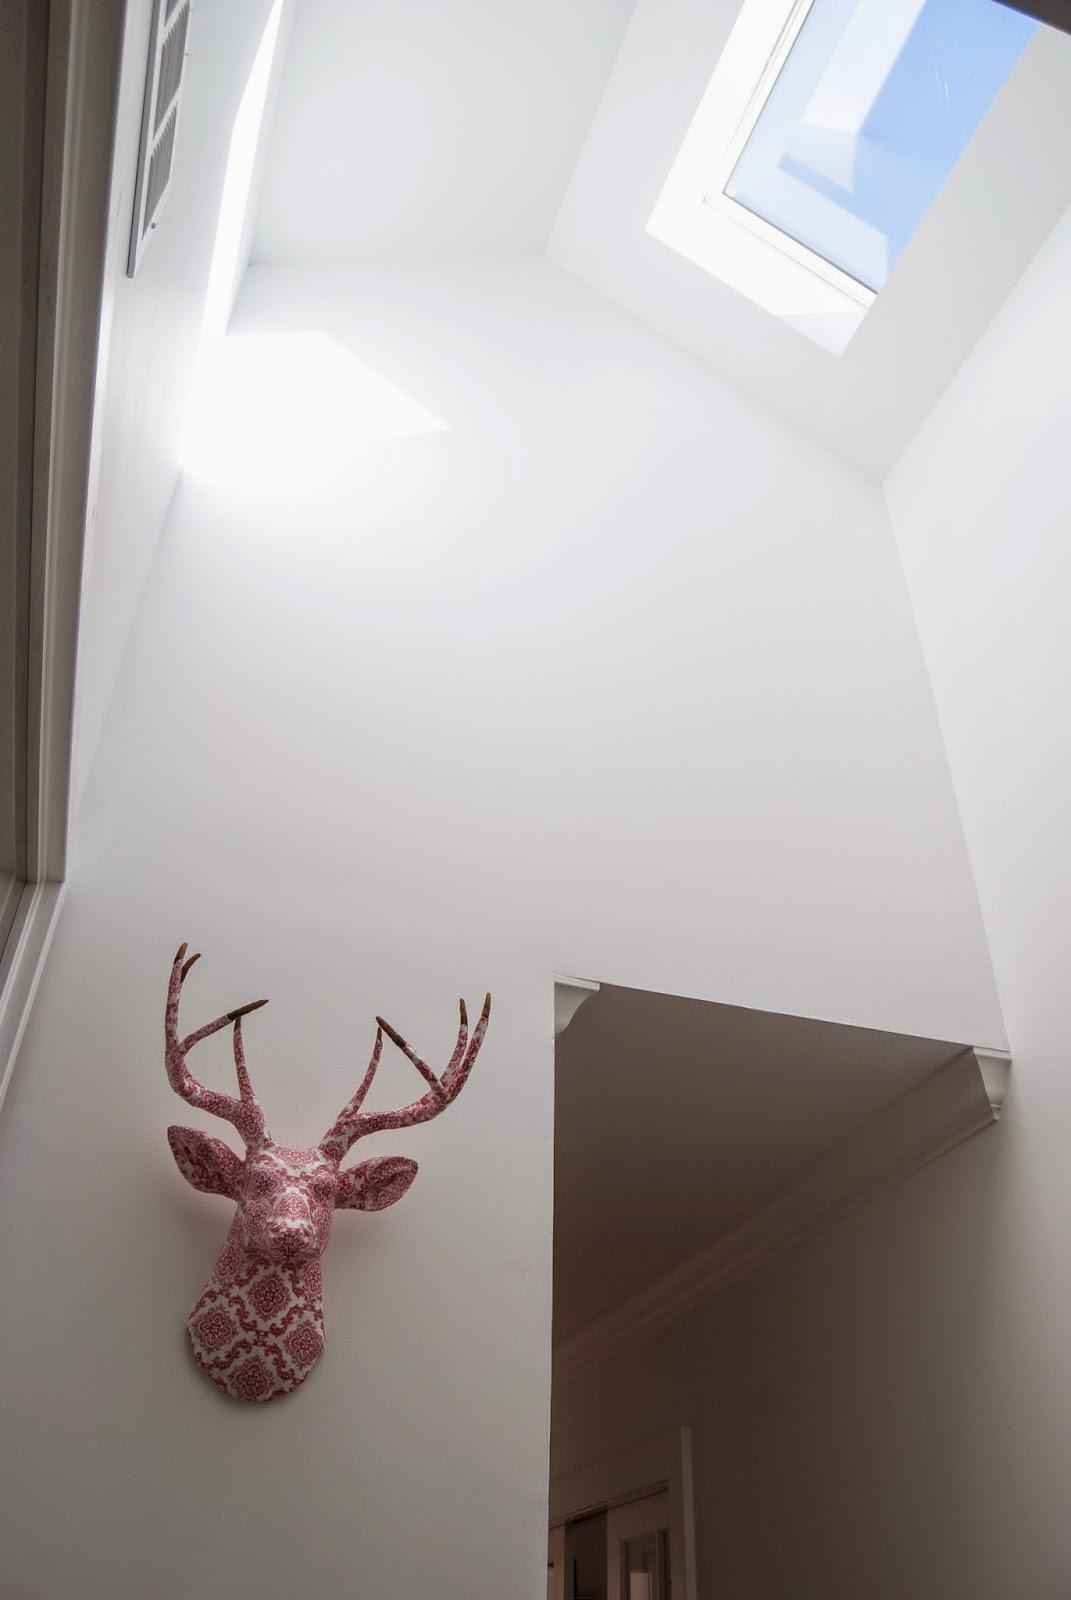 Hallway light source. Added skylight.